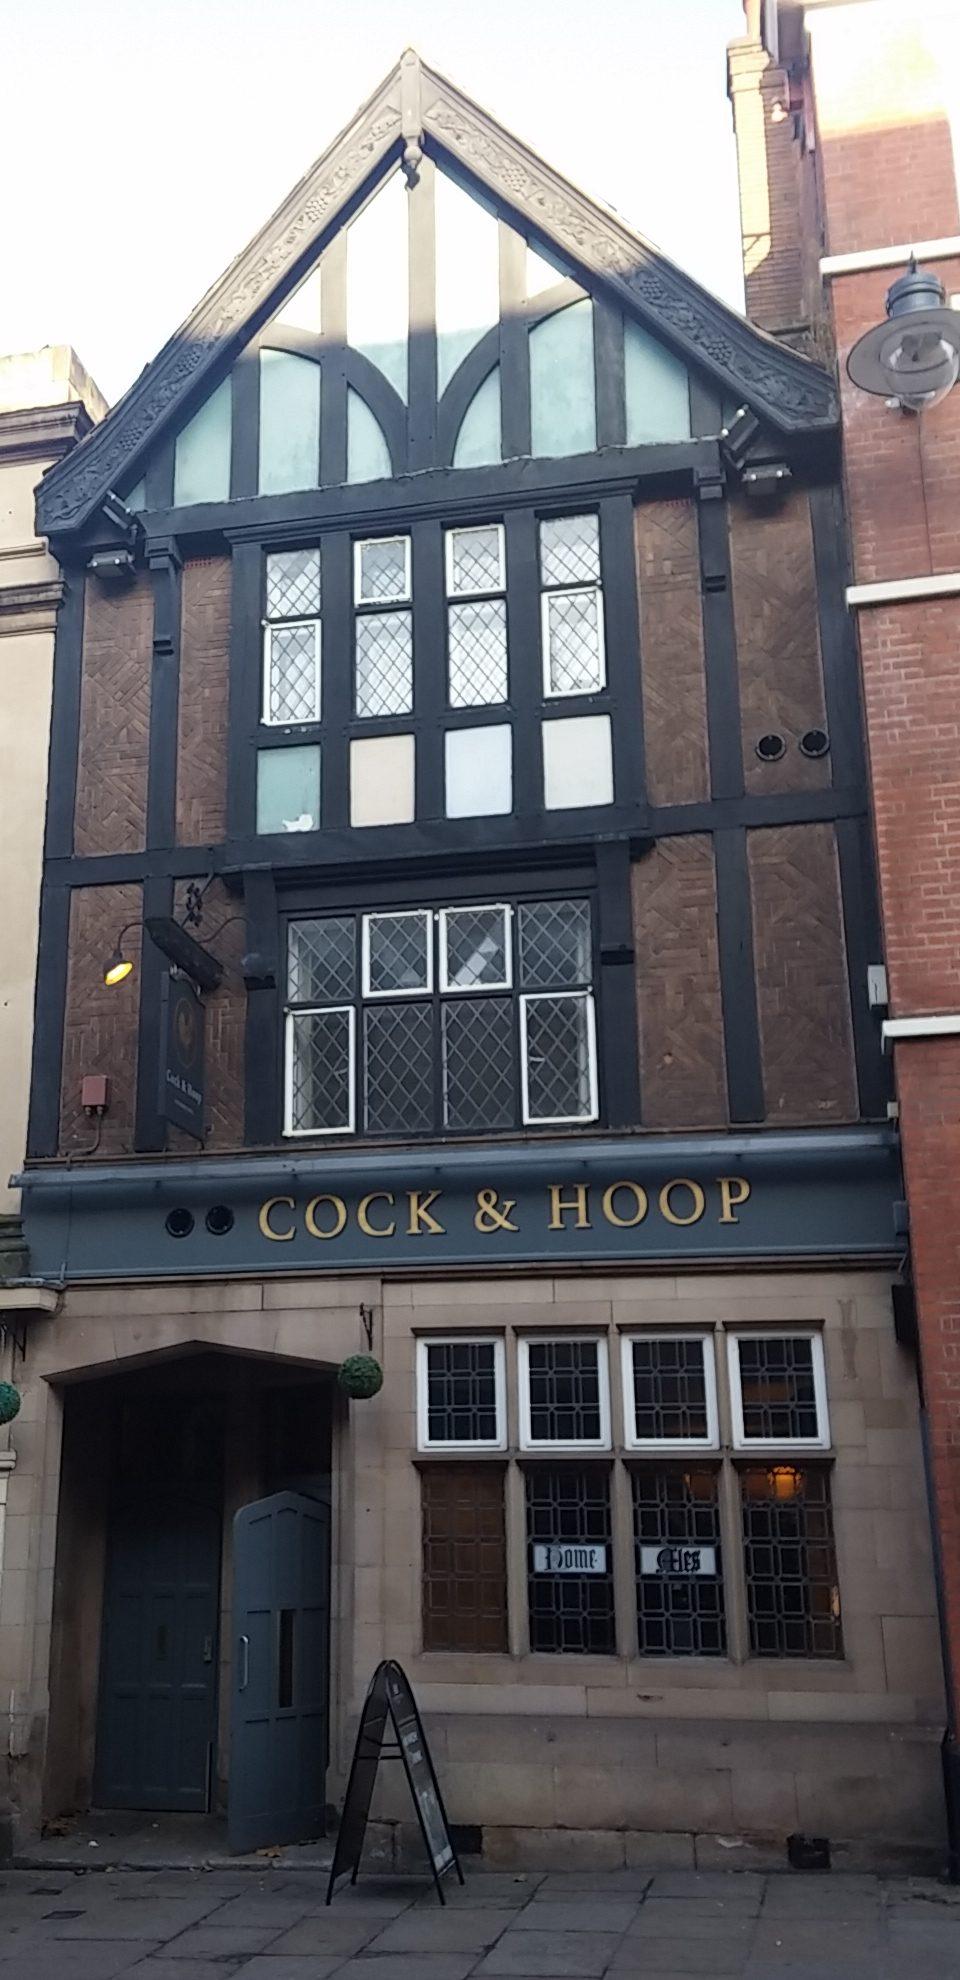 Pub review: Cock & Hoop, Nottingham